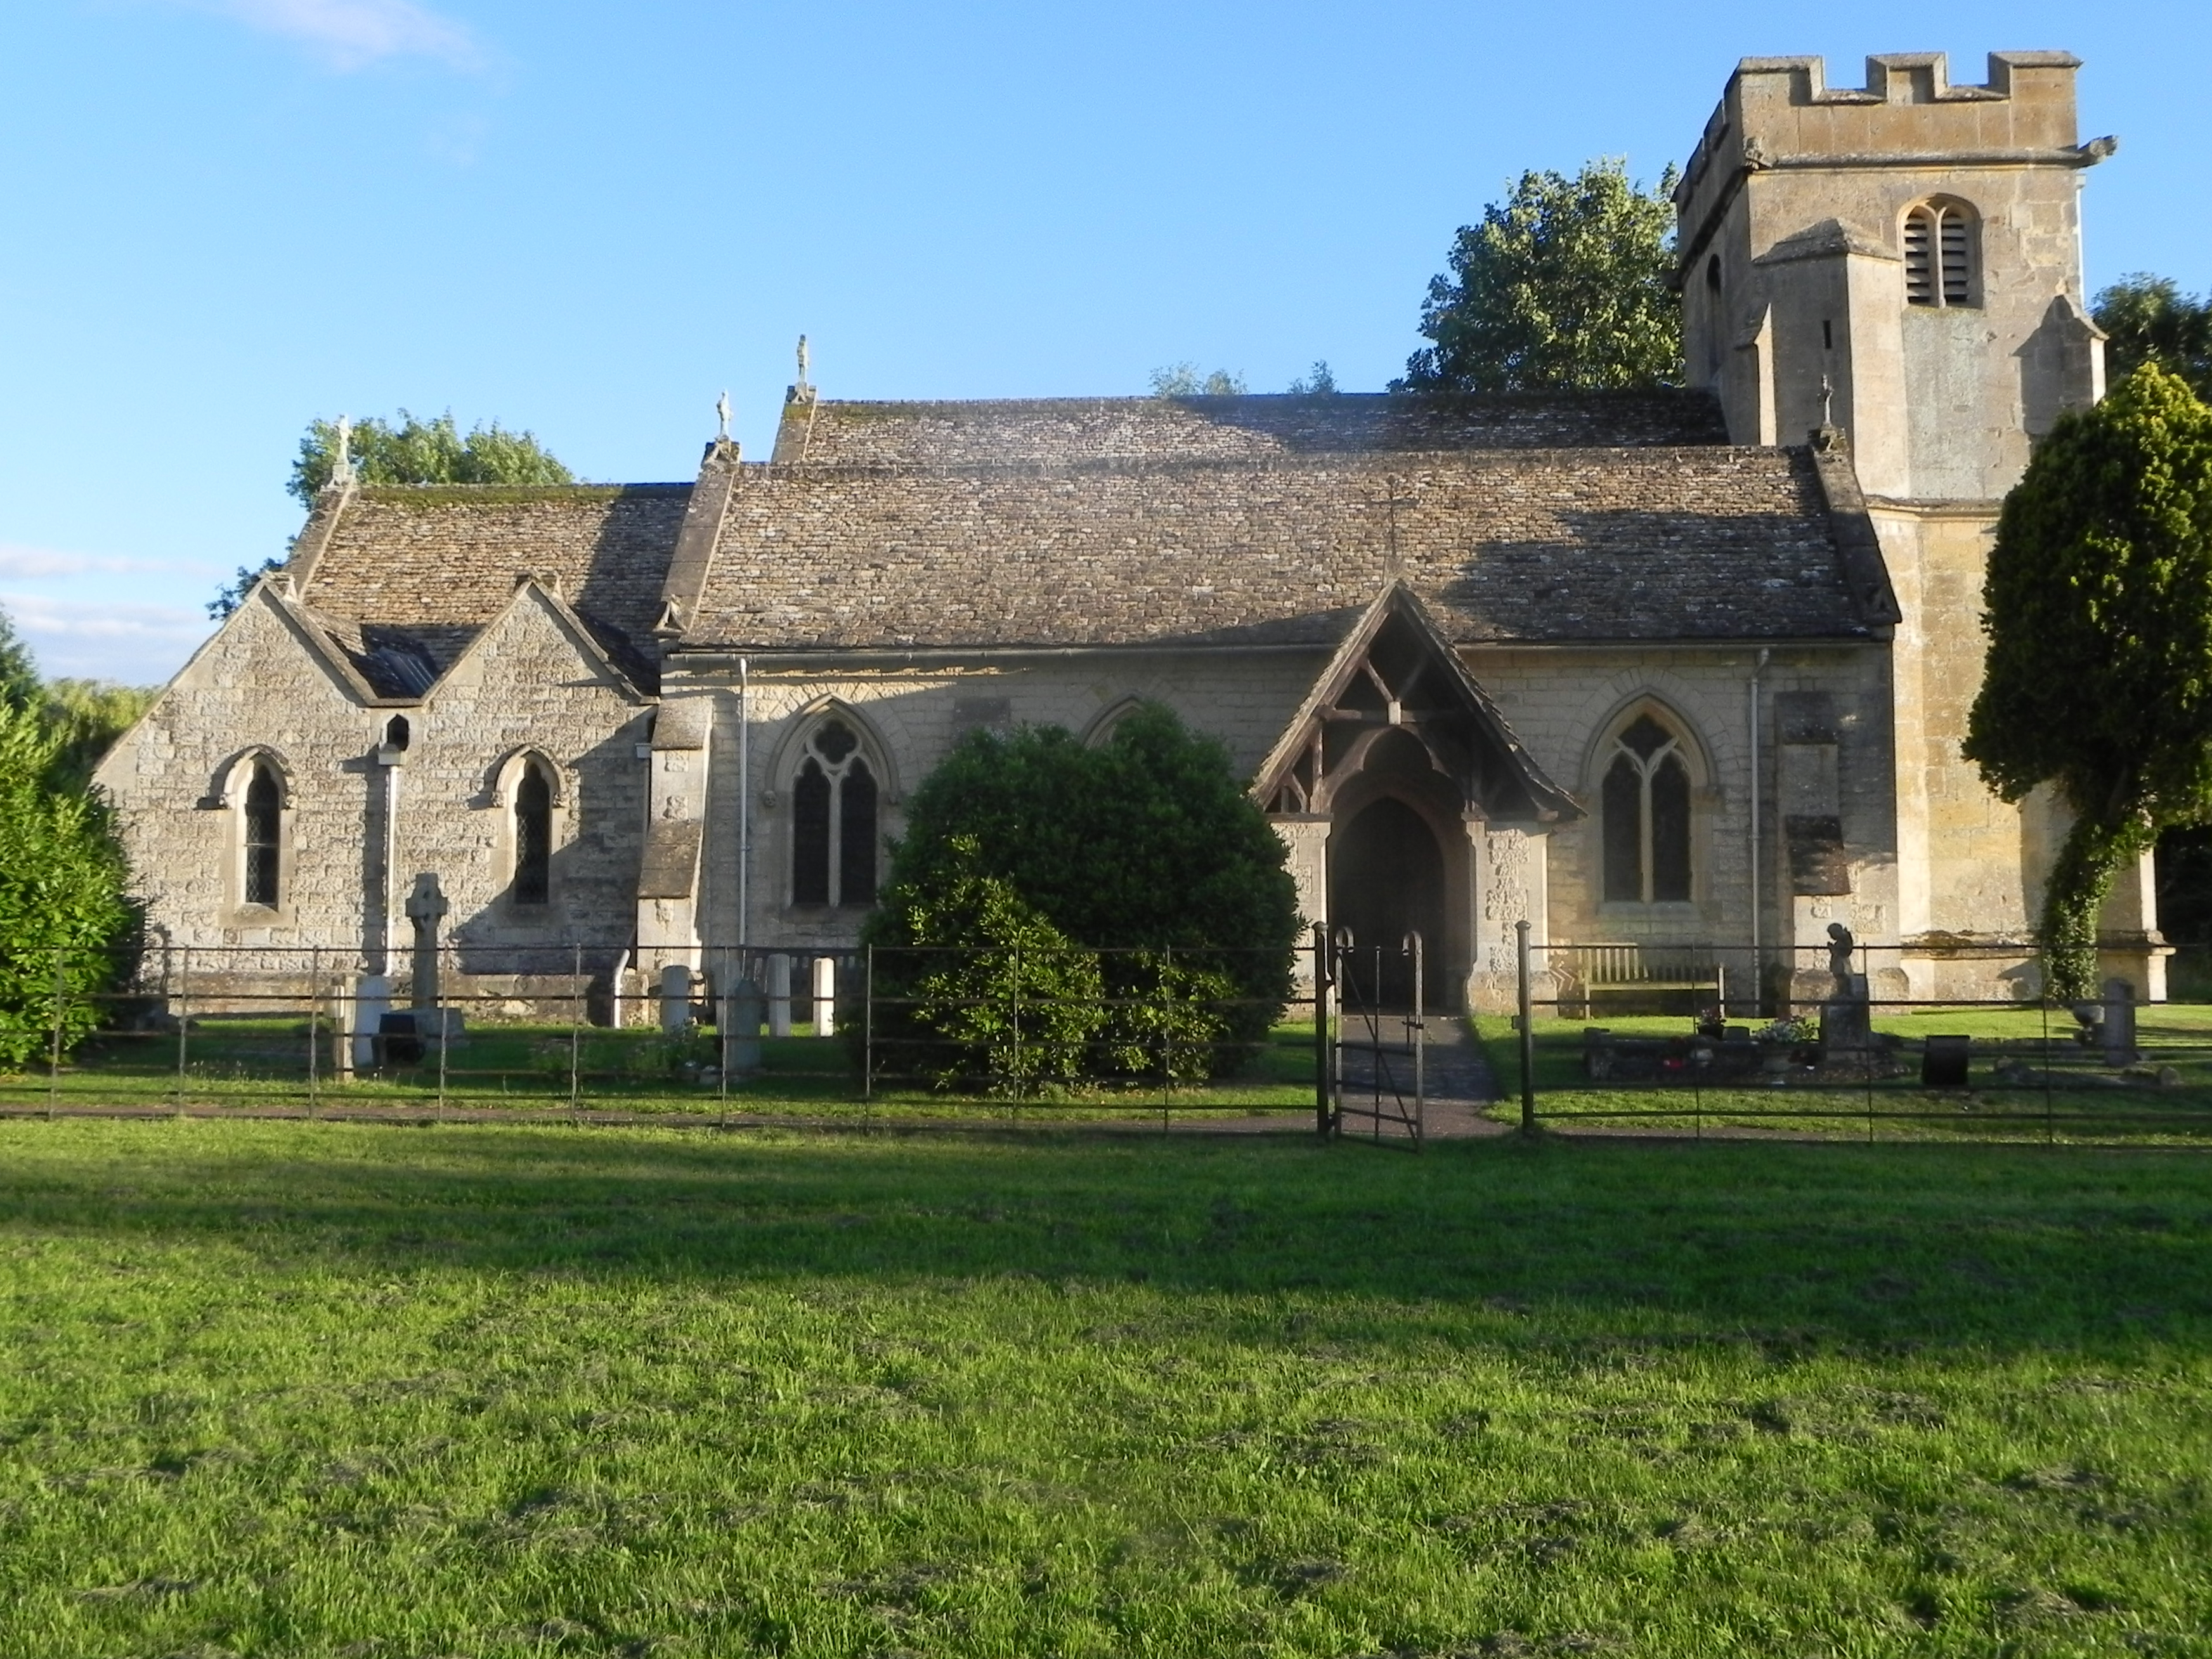 St Mary and Corpus Christi, Down Hatherley, Gloucestershire